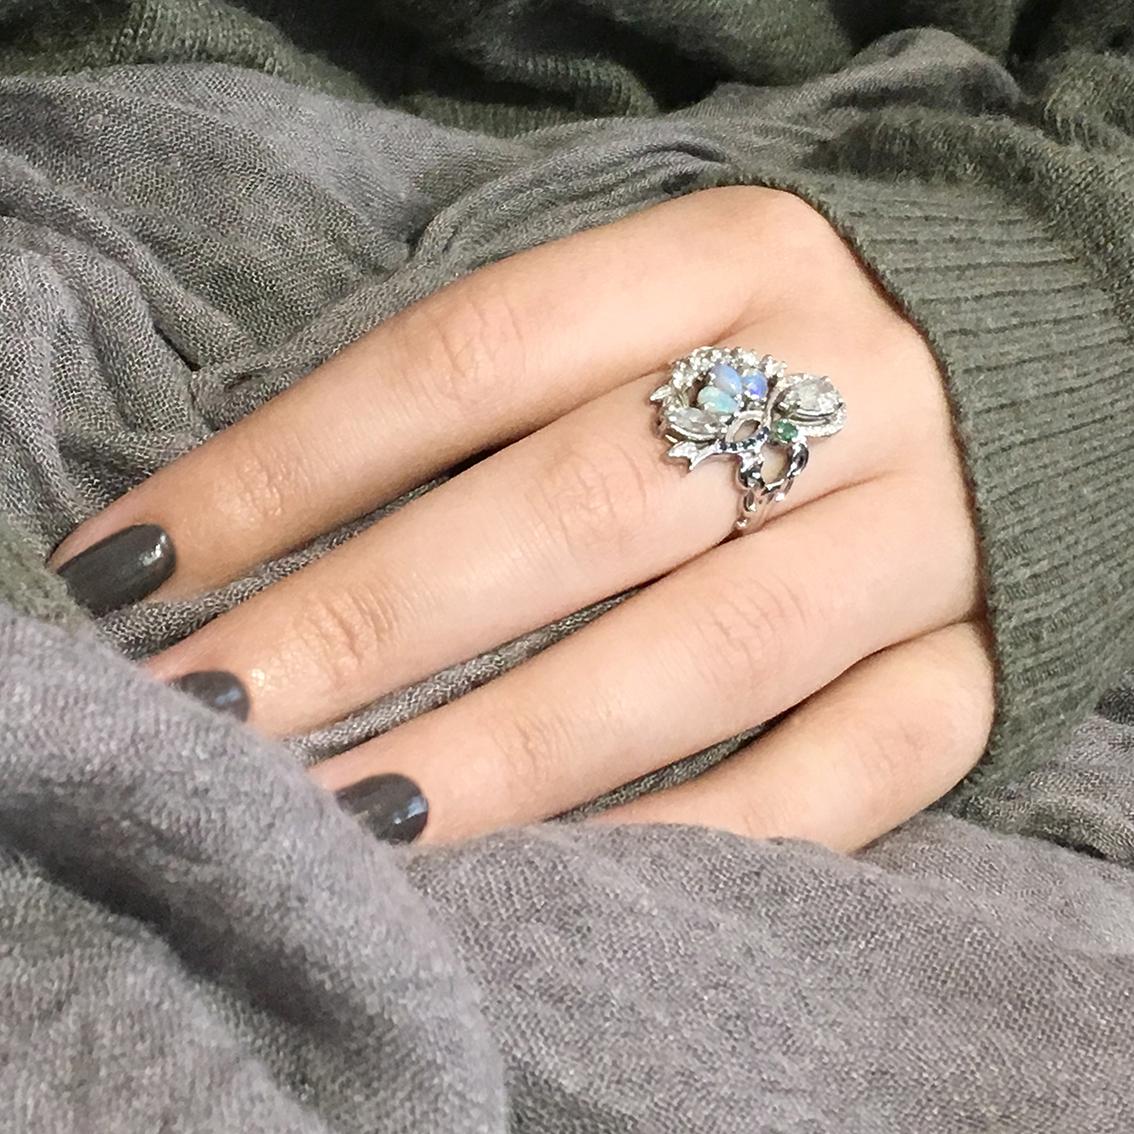 Jewelry Renewal and Custom Designs